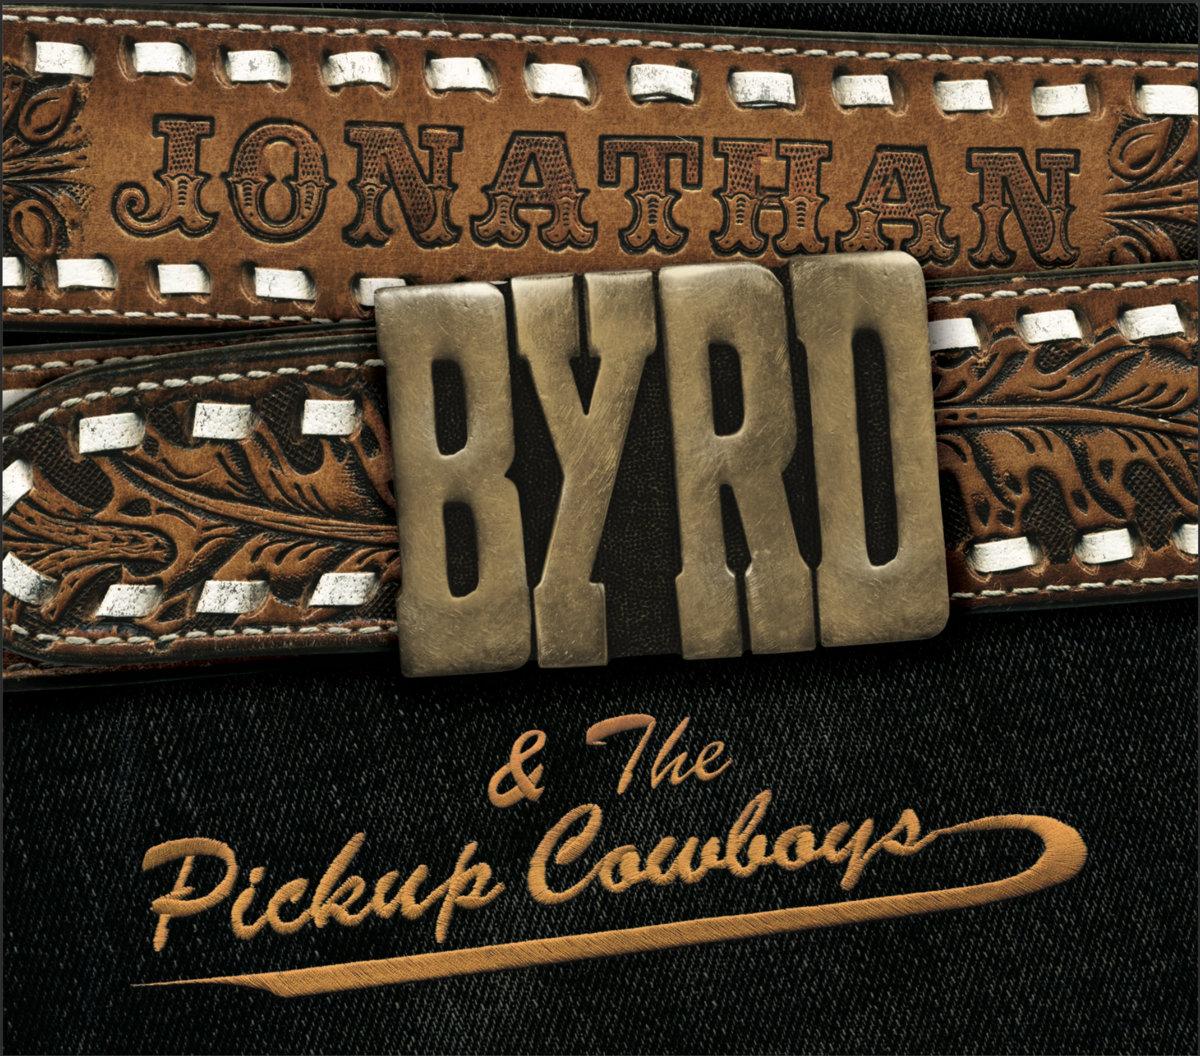 pickupcowboys.jpg